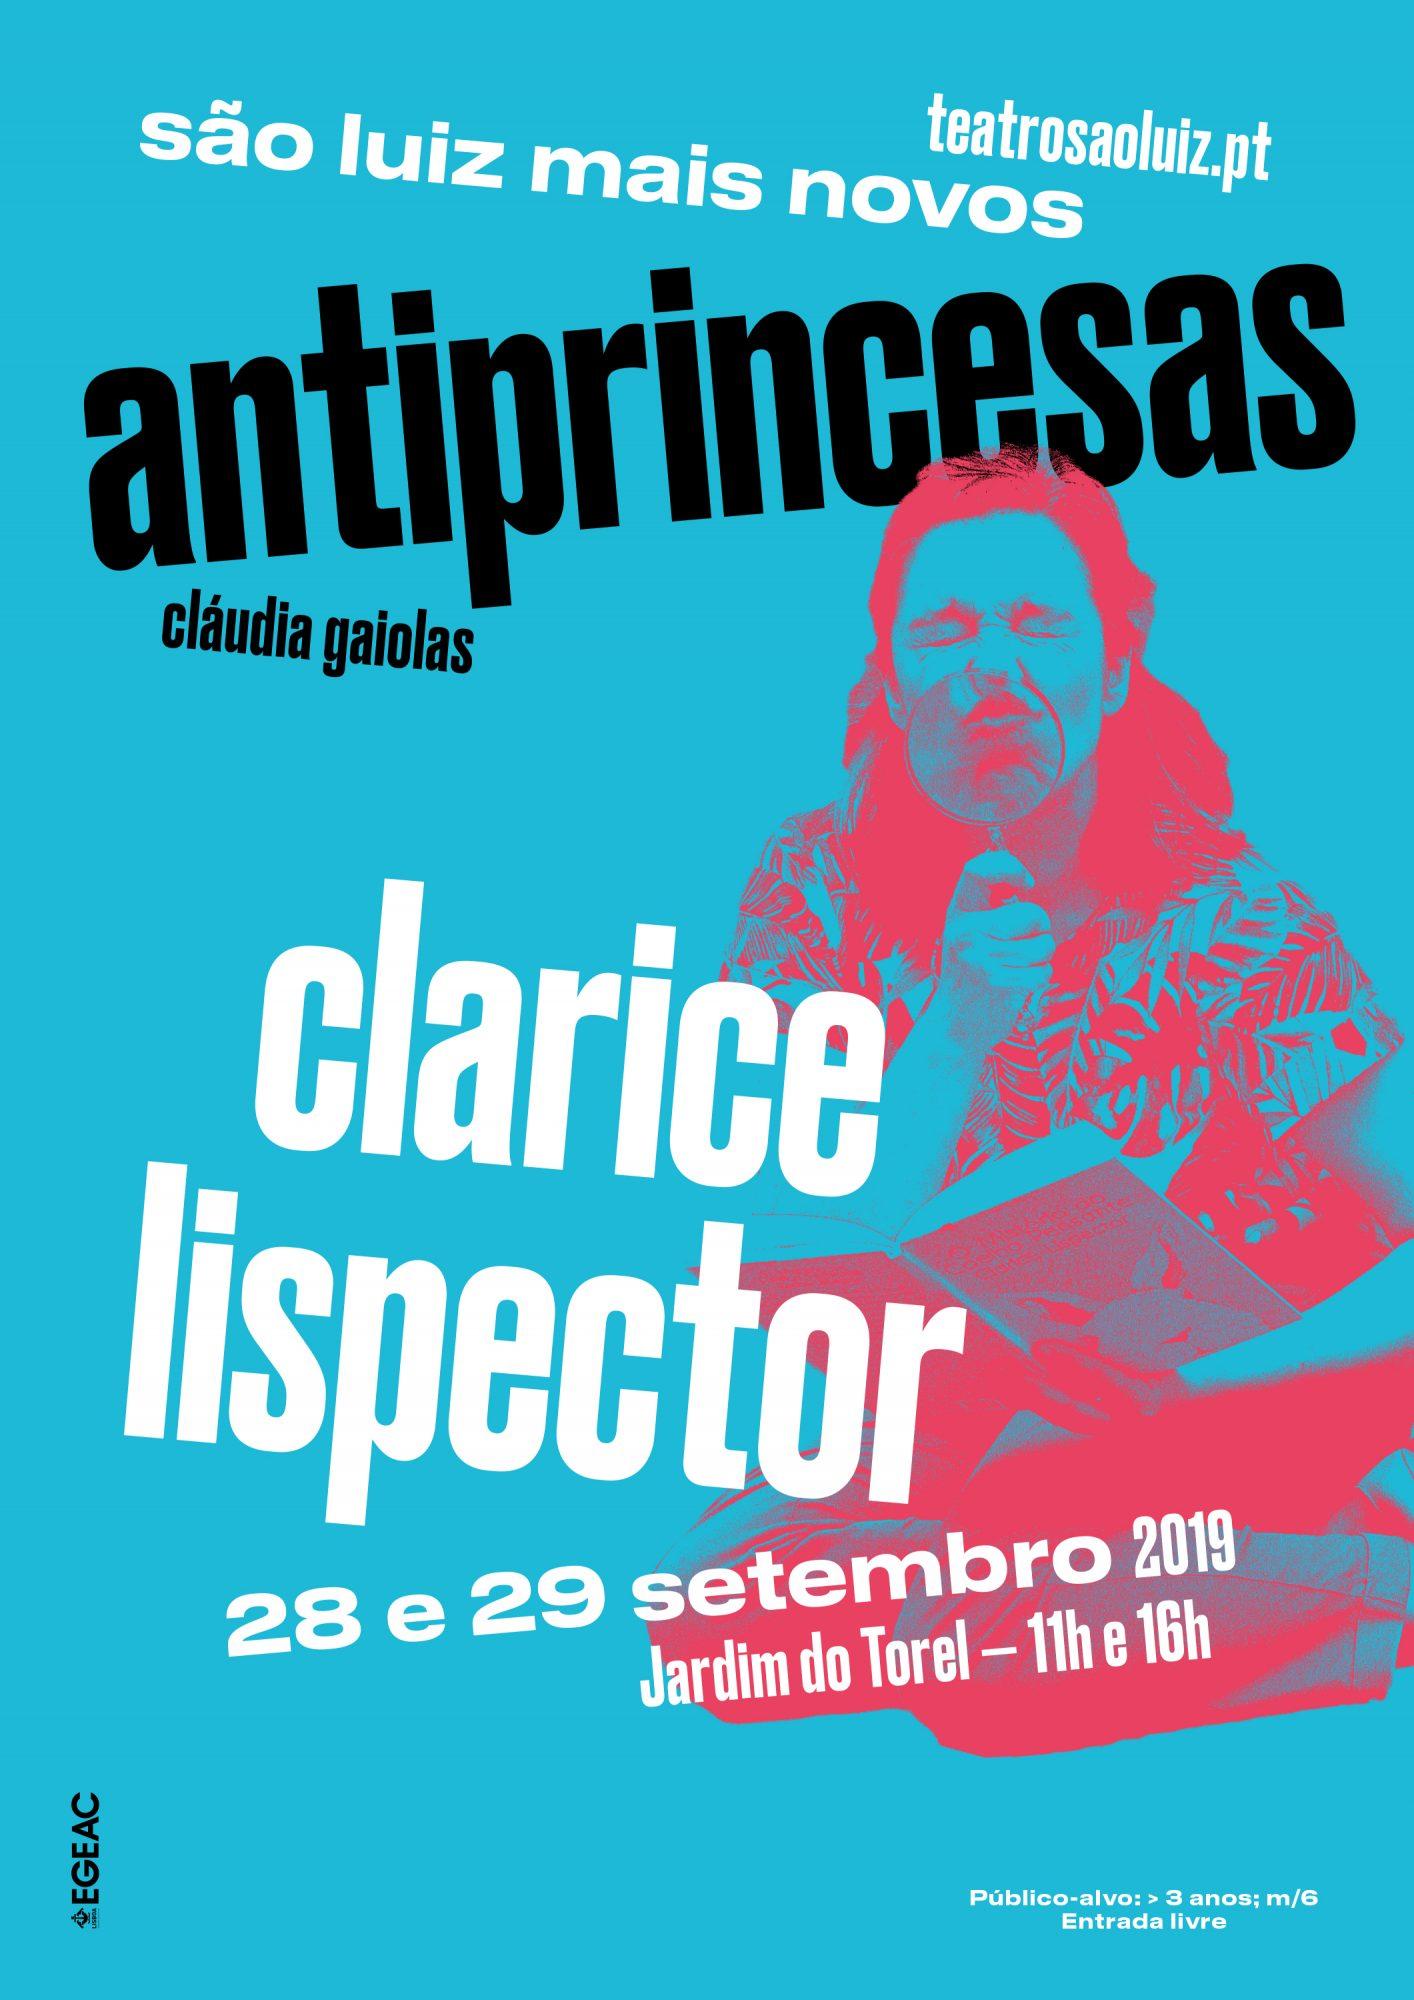 Antiprincesas - Clarice Lispector, setembro 2019